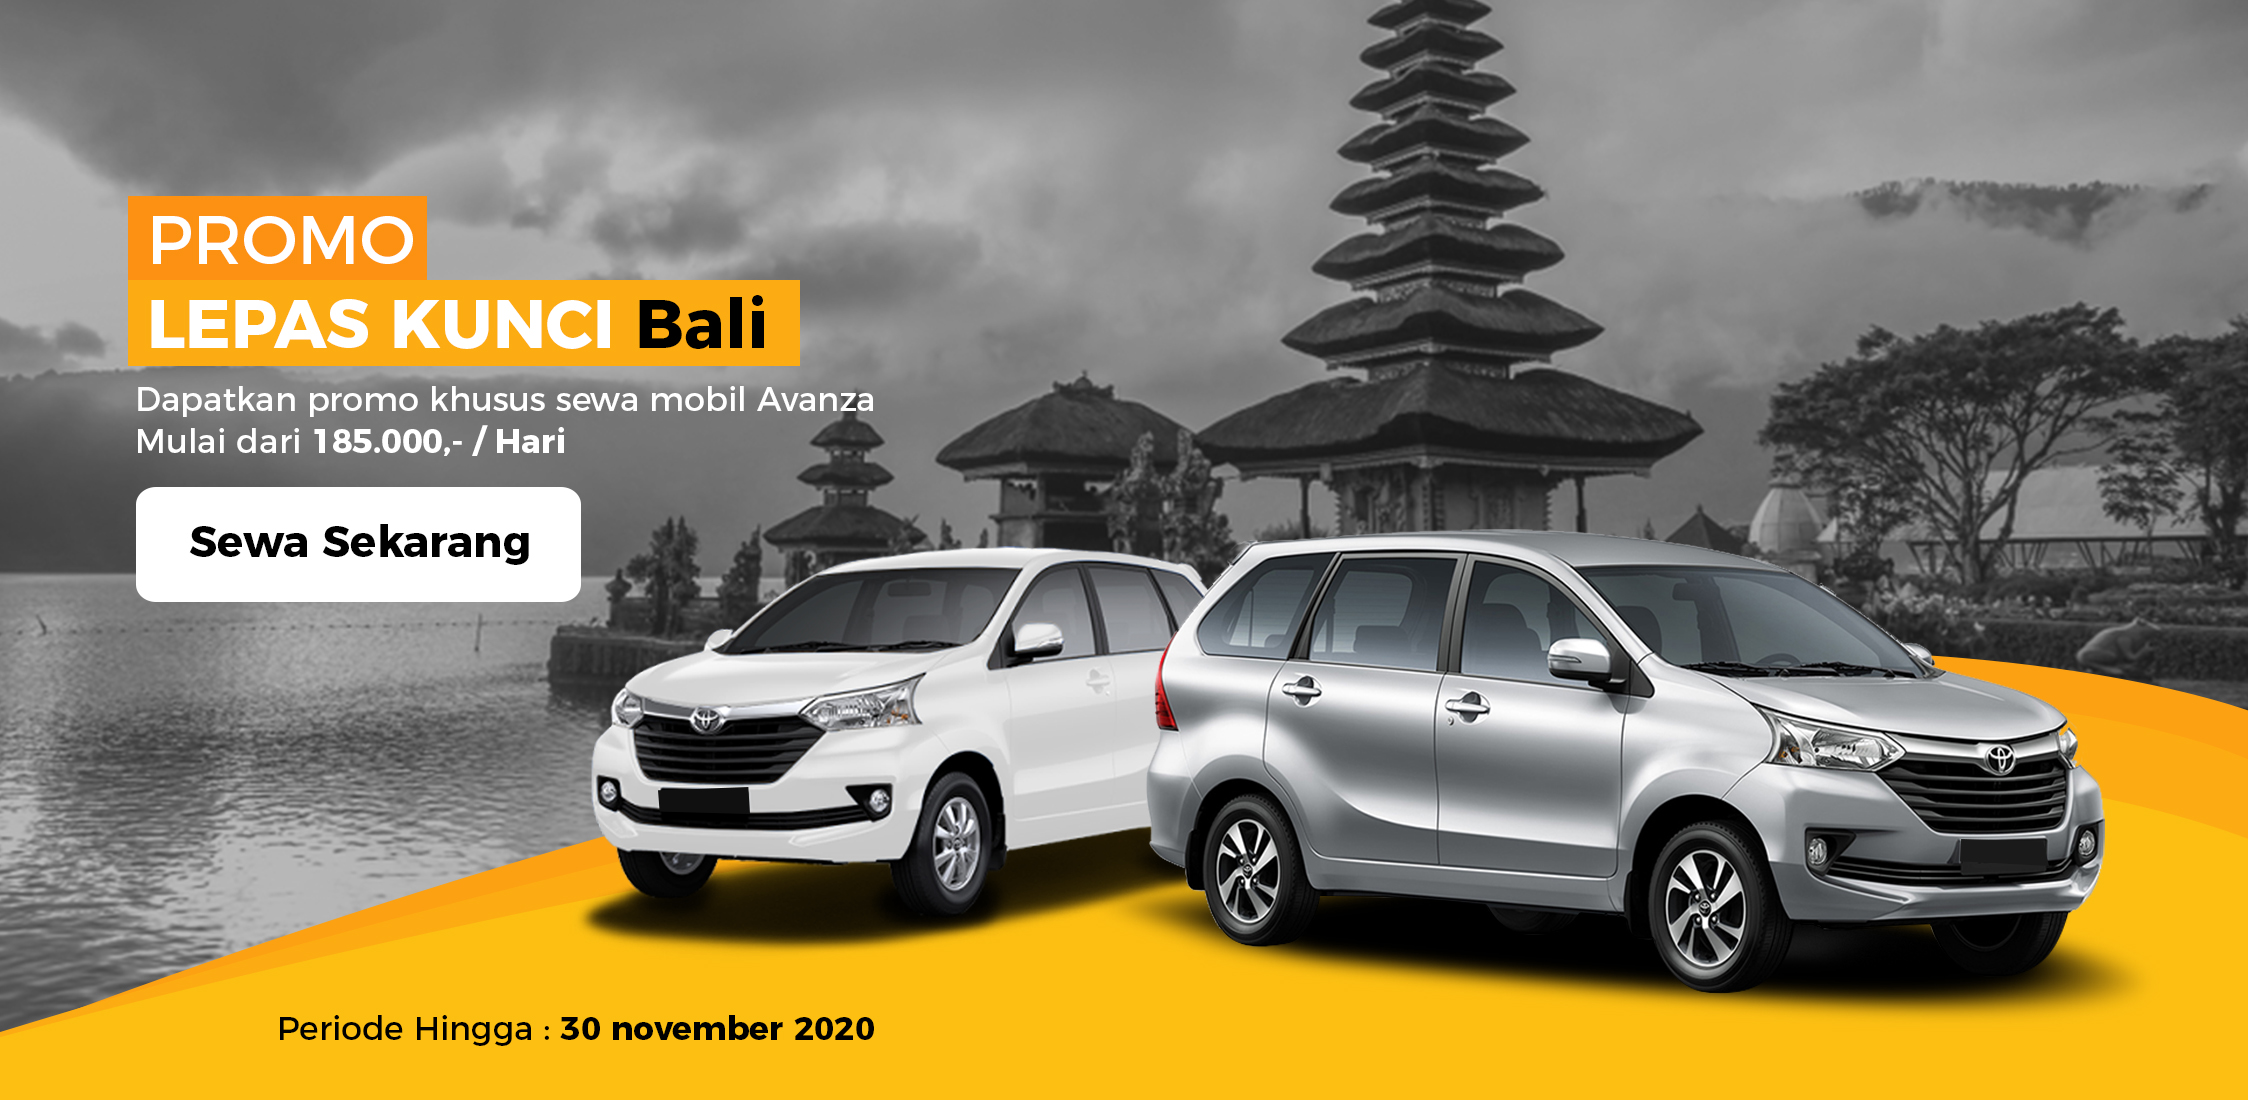 The Best Car Rental In Indonesia Nemob